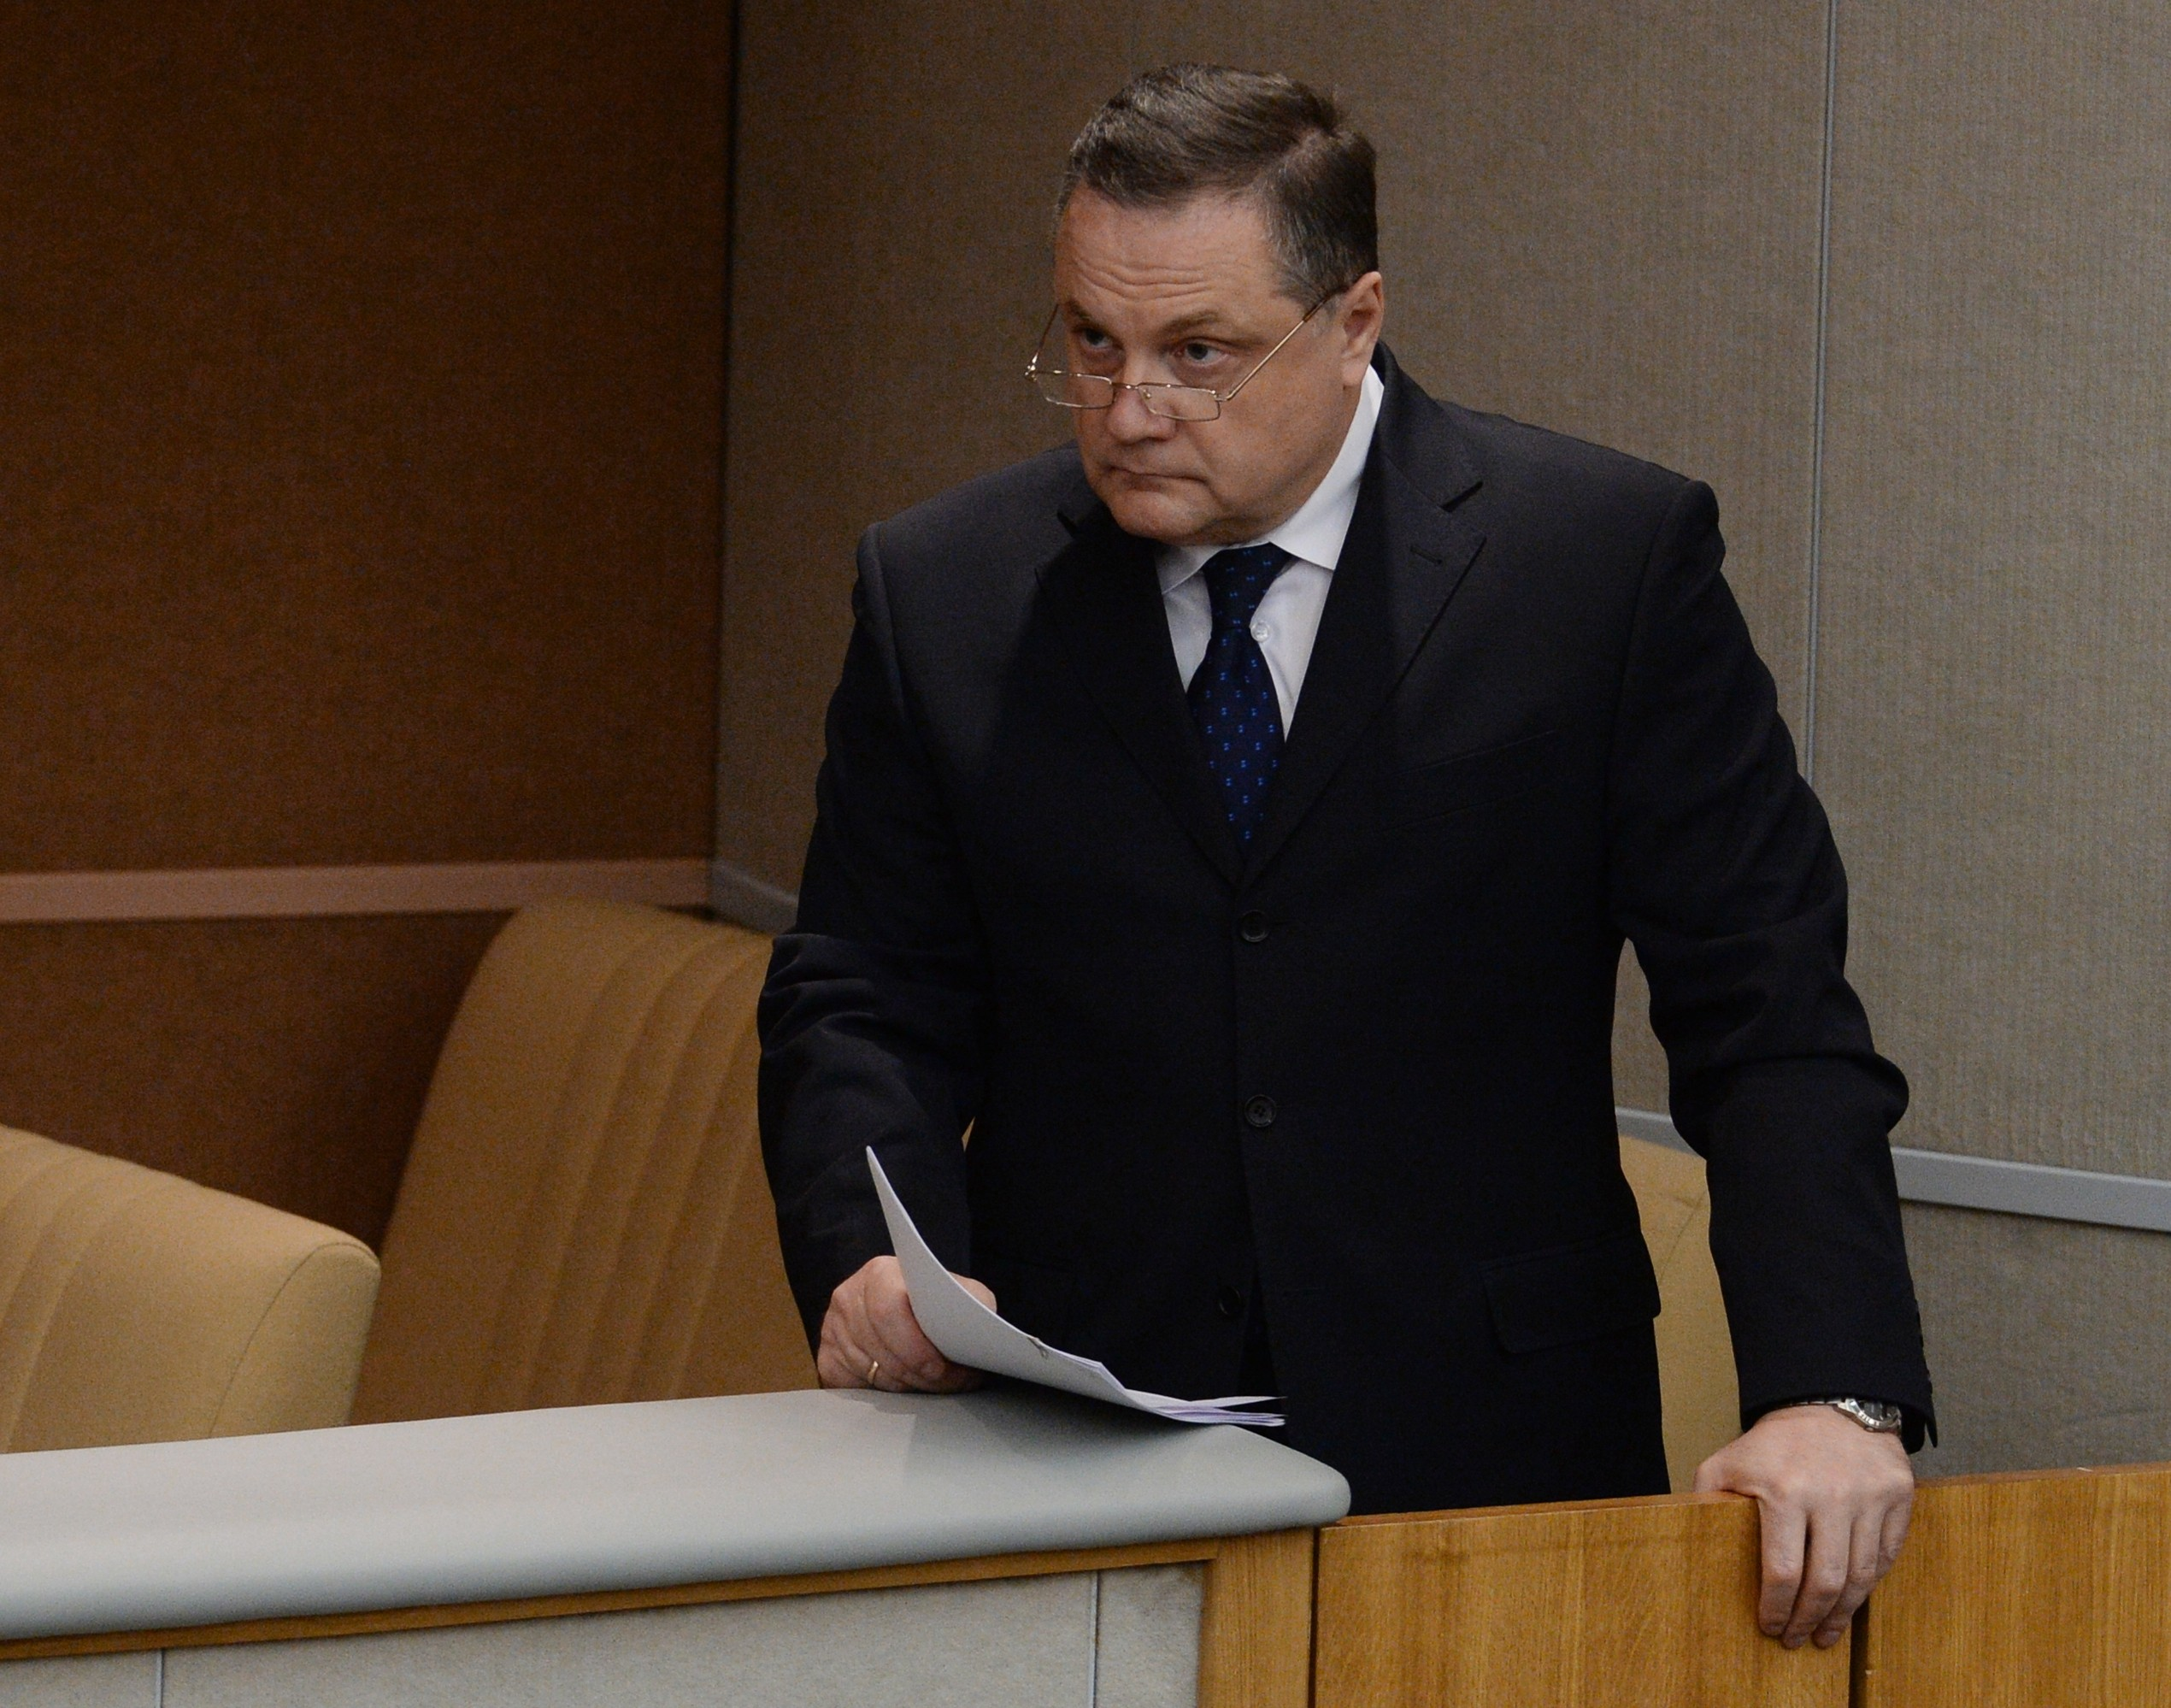 <p>Владимир Артамонов.&nbsp;Фото: &copy;РИА Новости/Владимир Федоренко</p>